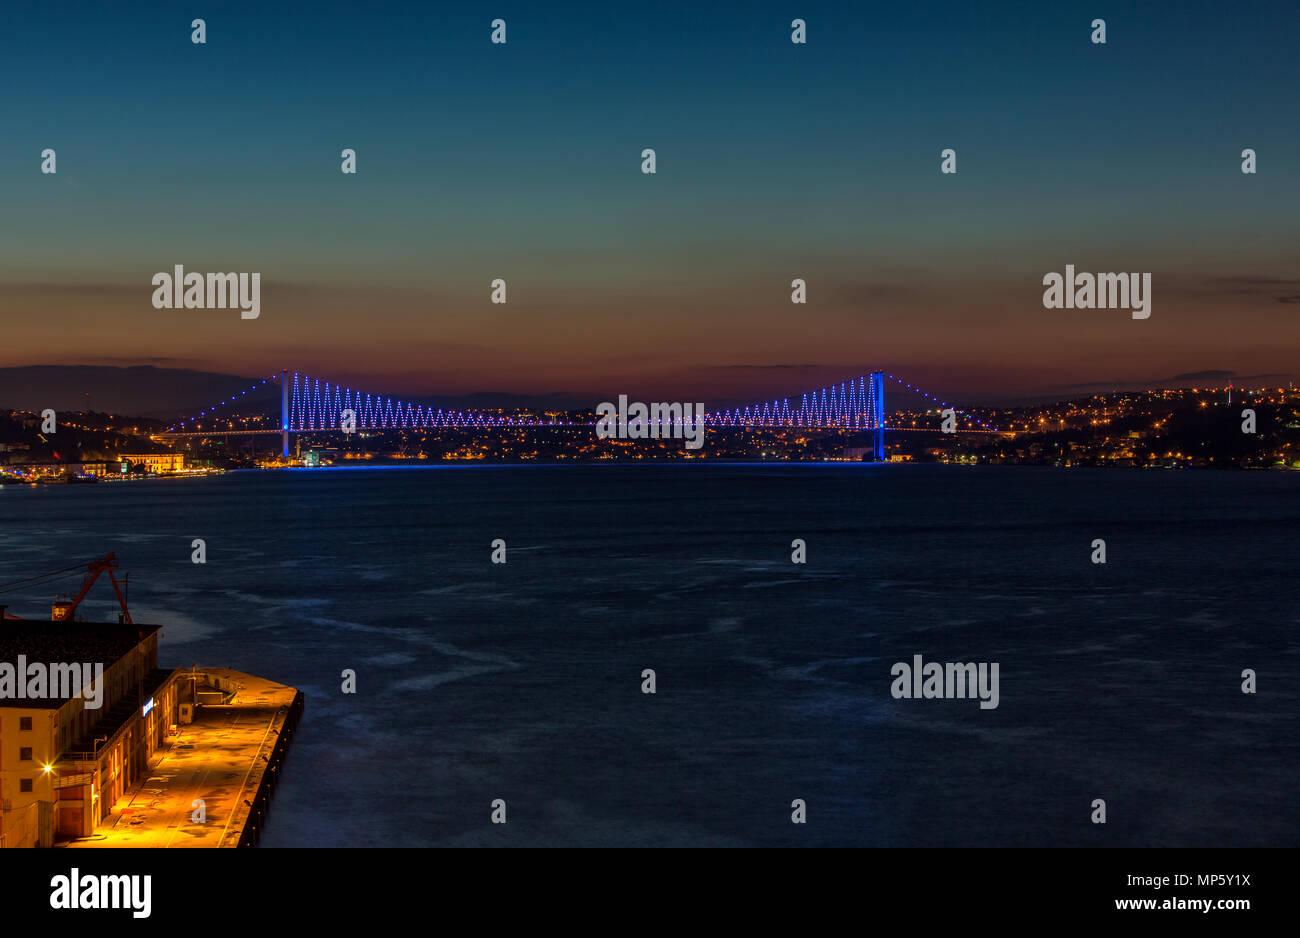 Istanbu. Stock Photo